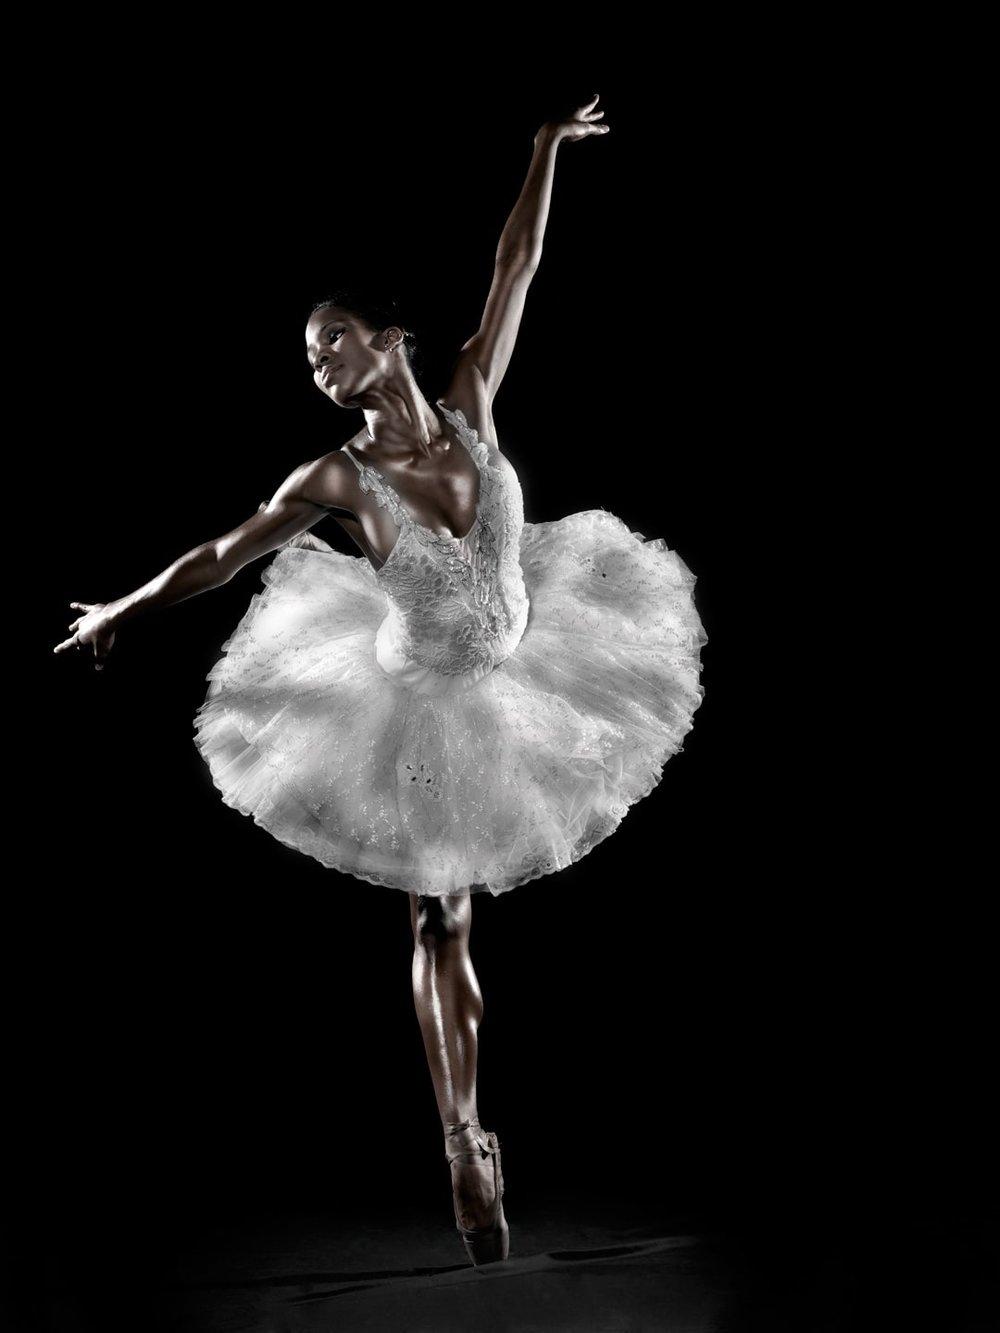 photograper-miami-marcel-boldu-ballet.jpg